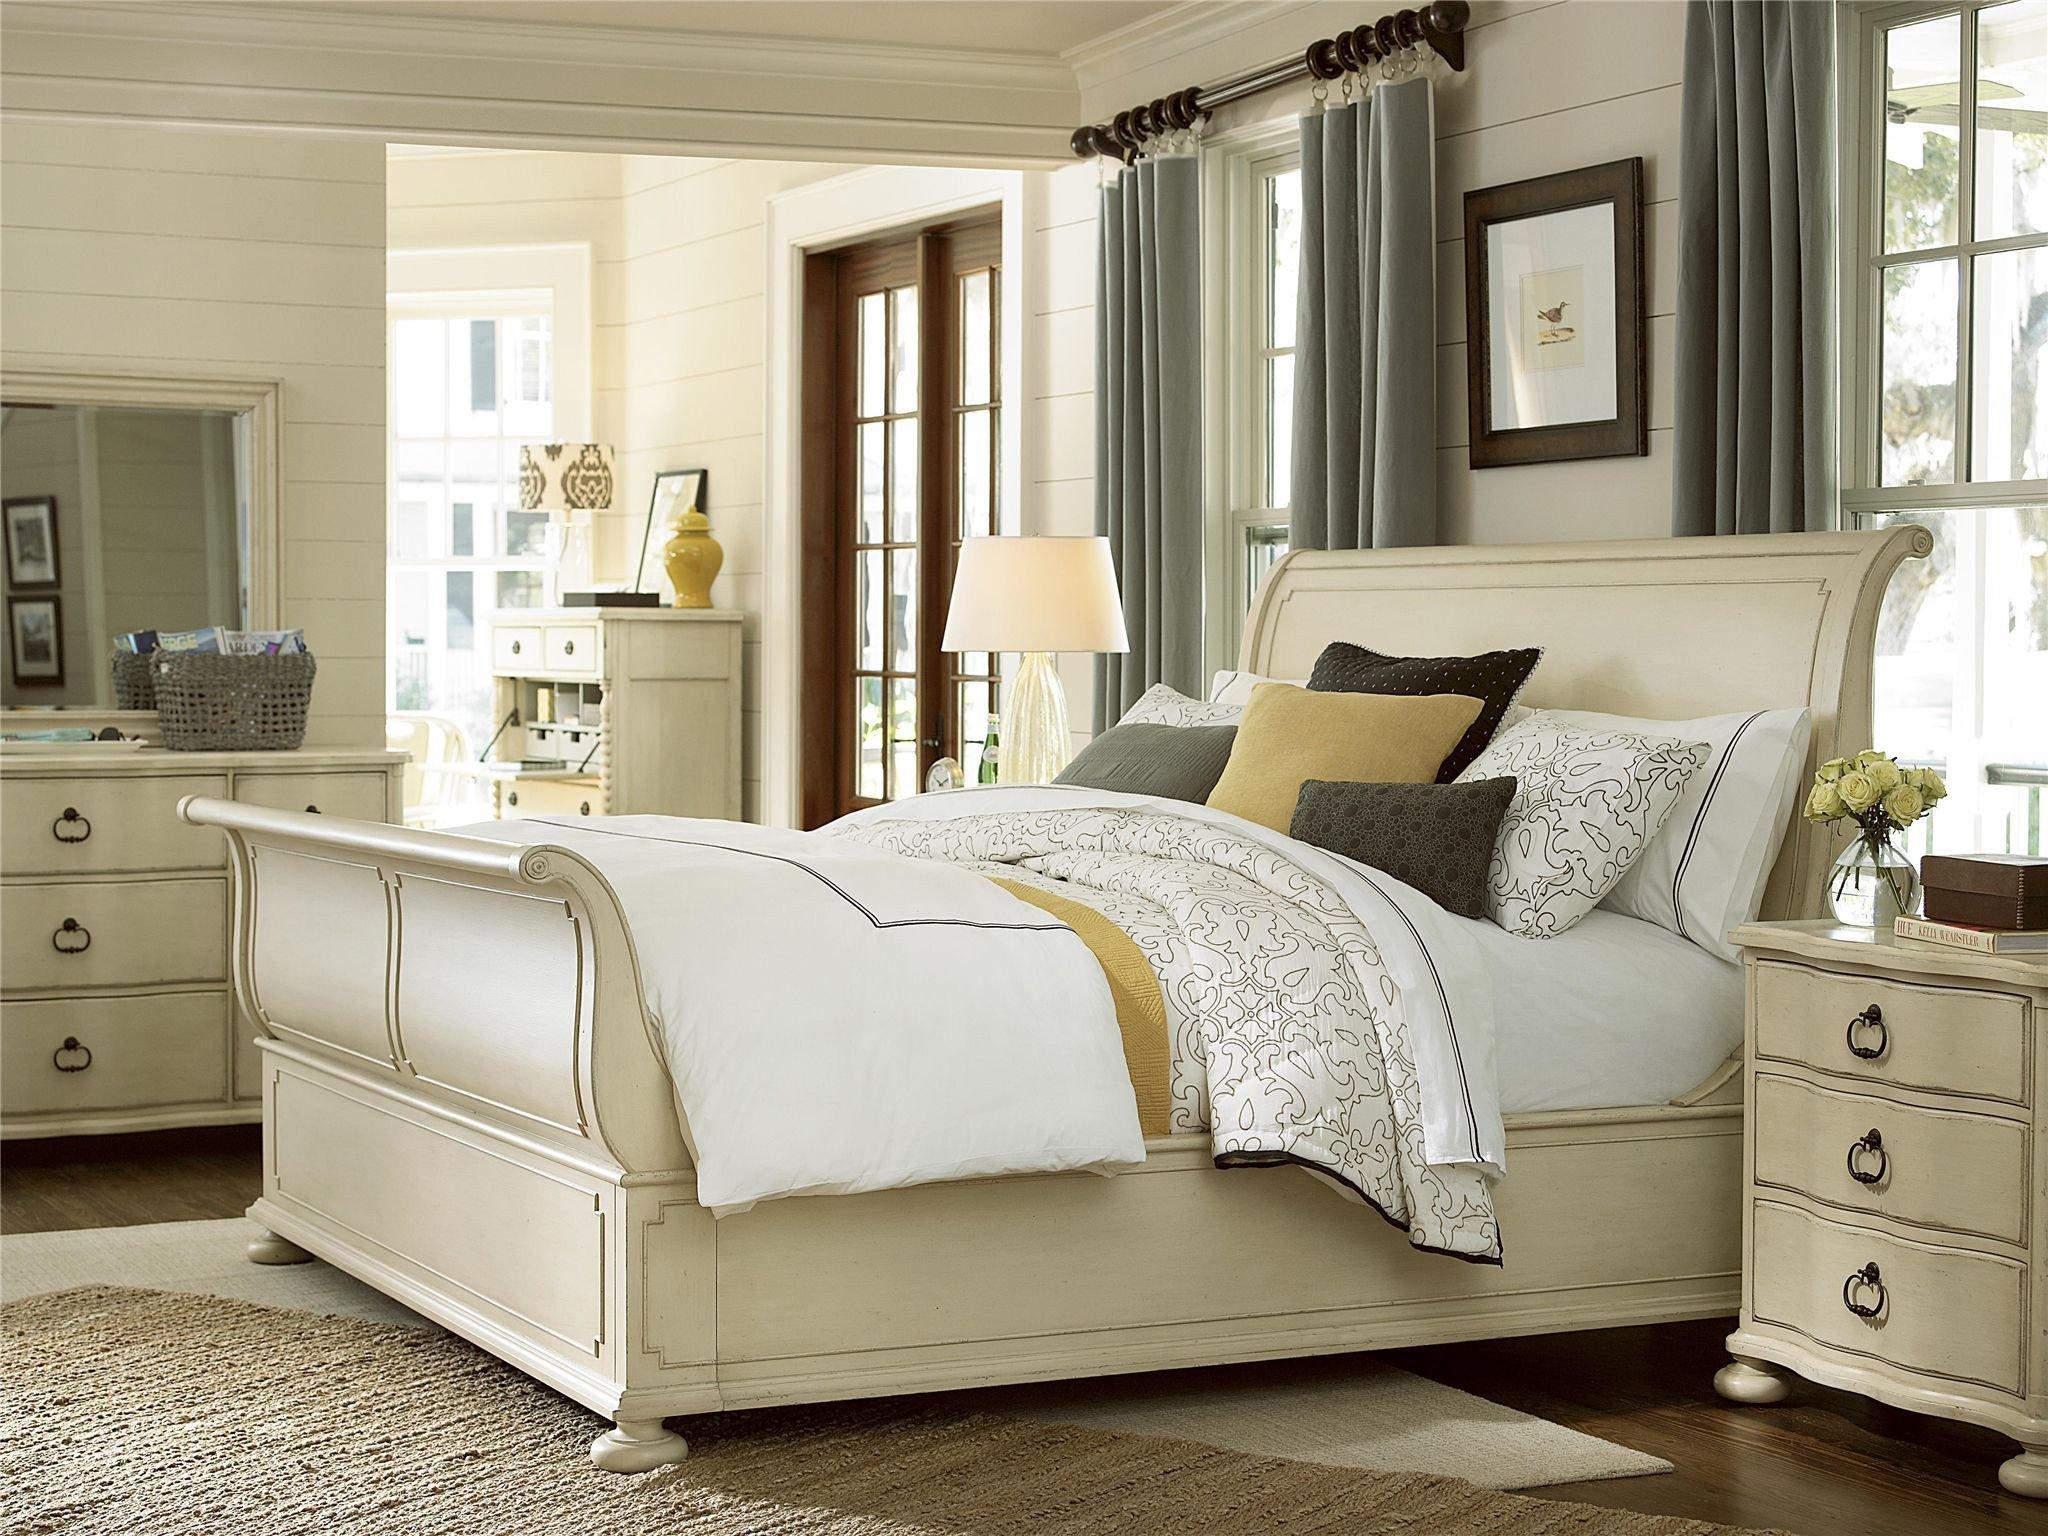 Paula Deen Steel Magnolia Bedroom Set Awesome 63 Best Paula Deen Furniture Images